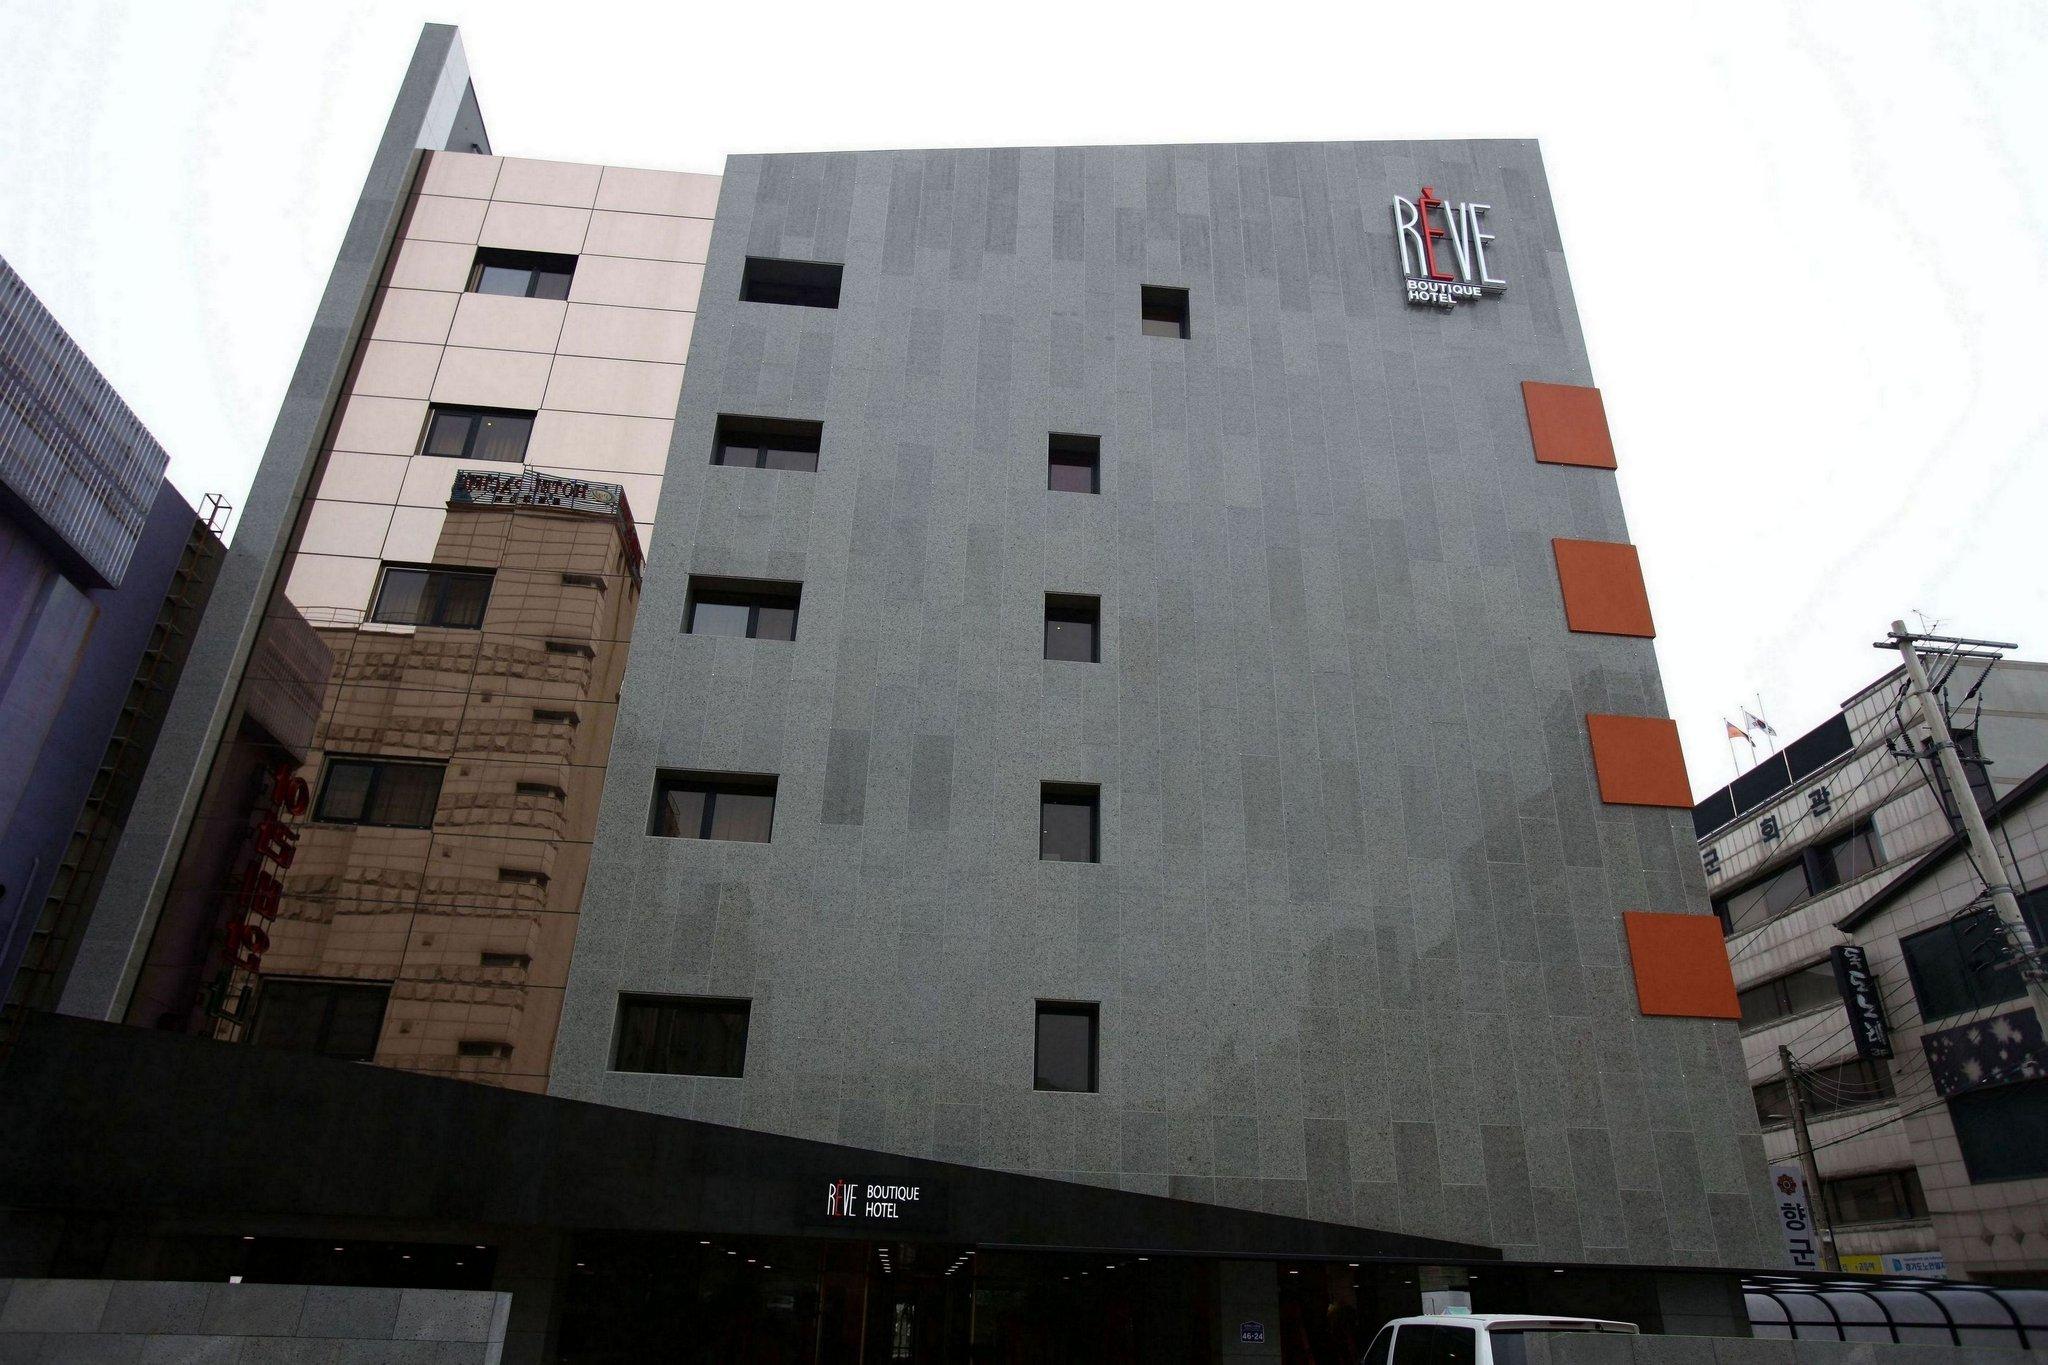 Reve Hotel